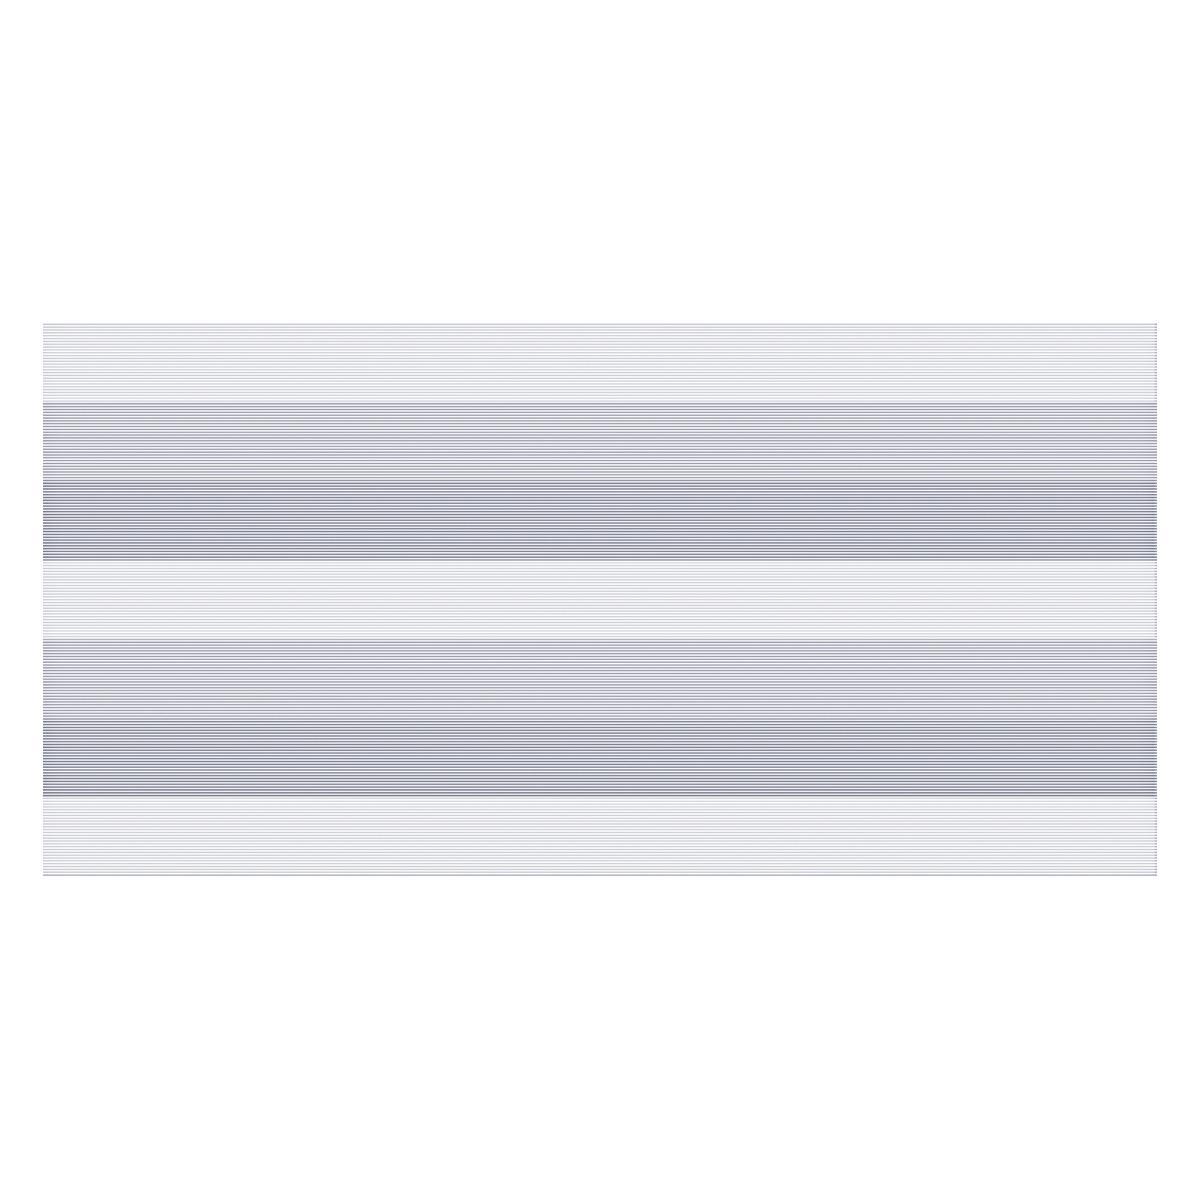 Mayólica Lineare Gris Brillante - 30X60 cm - 1.63 m2